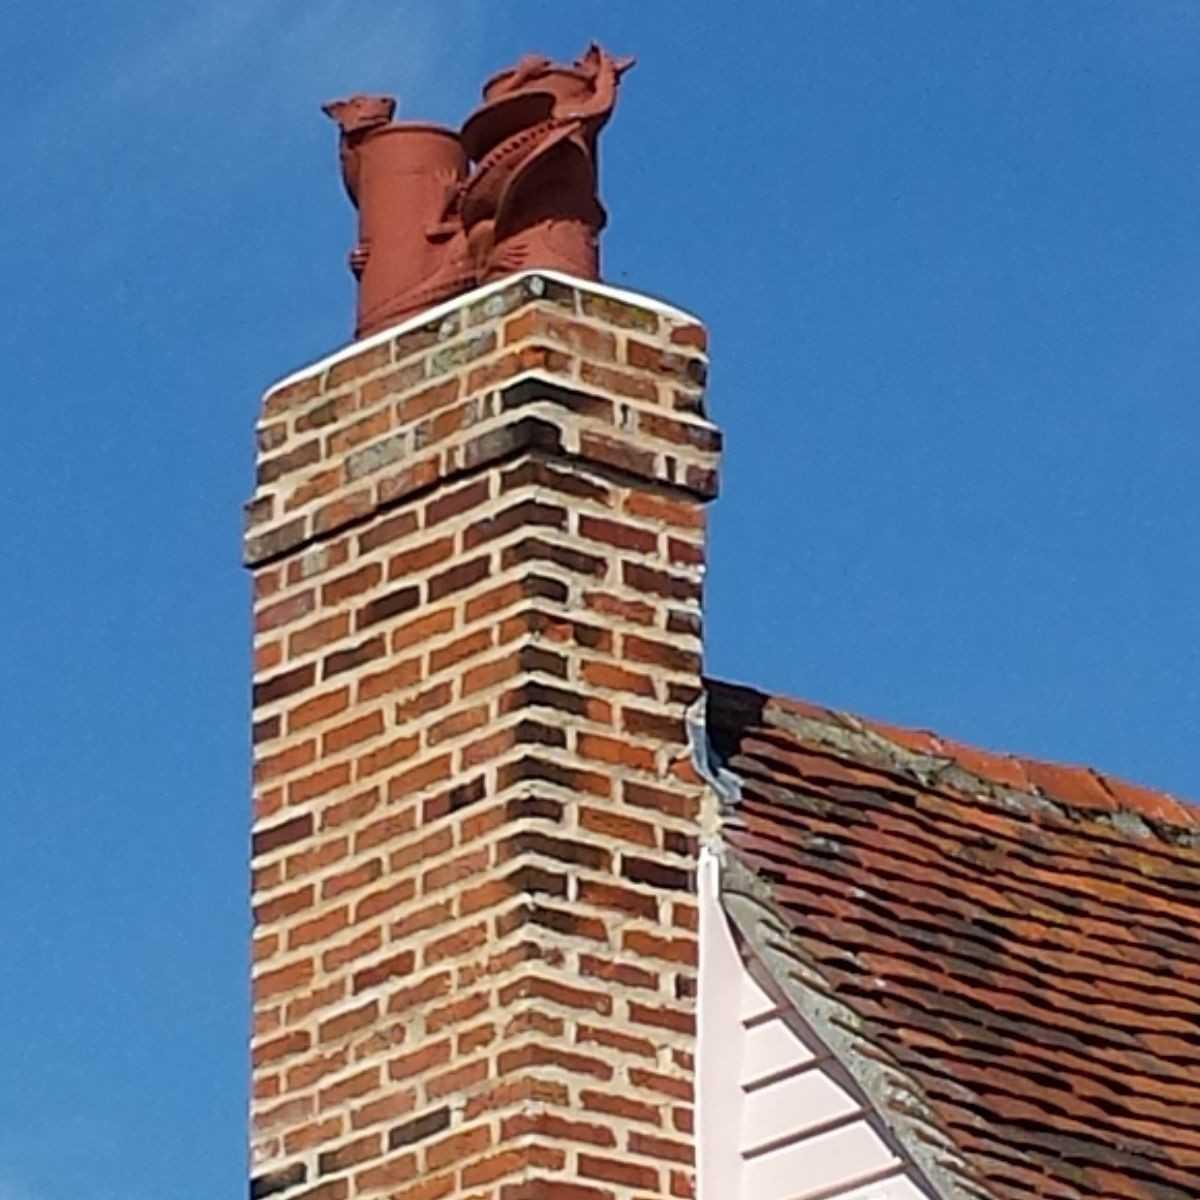 just landed dragon chimney pot - terracotta